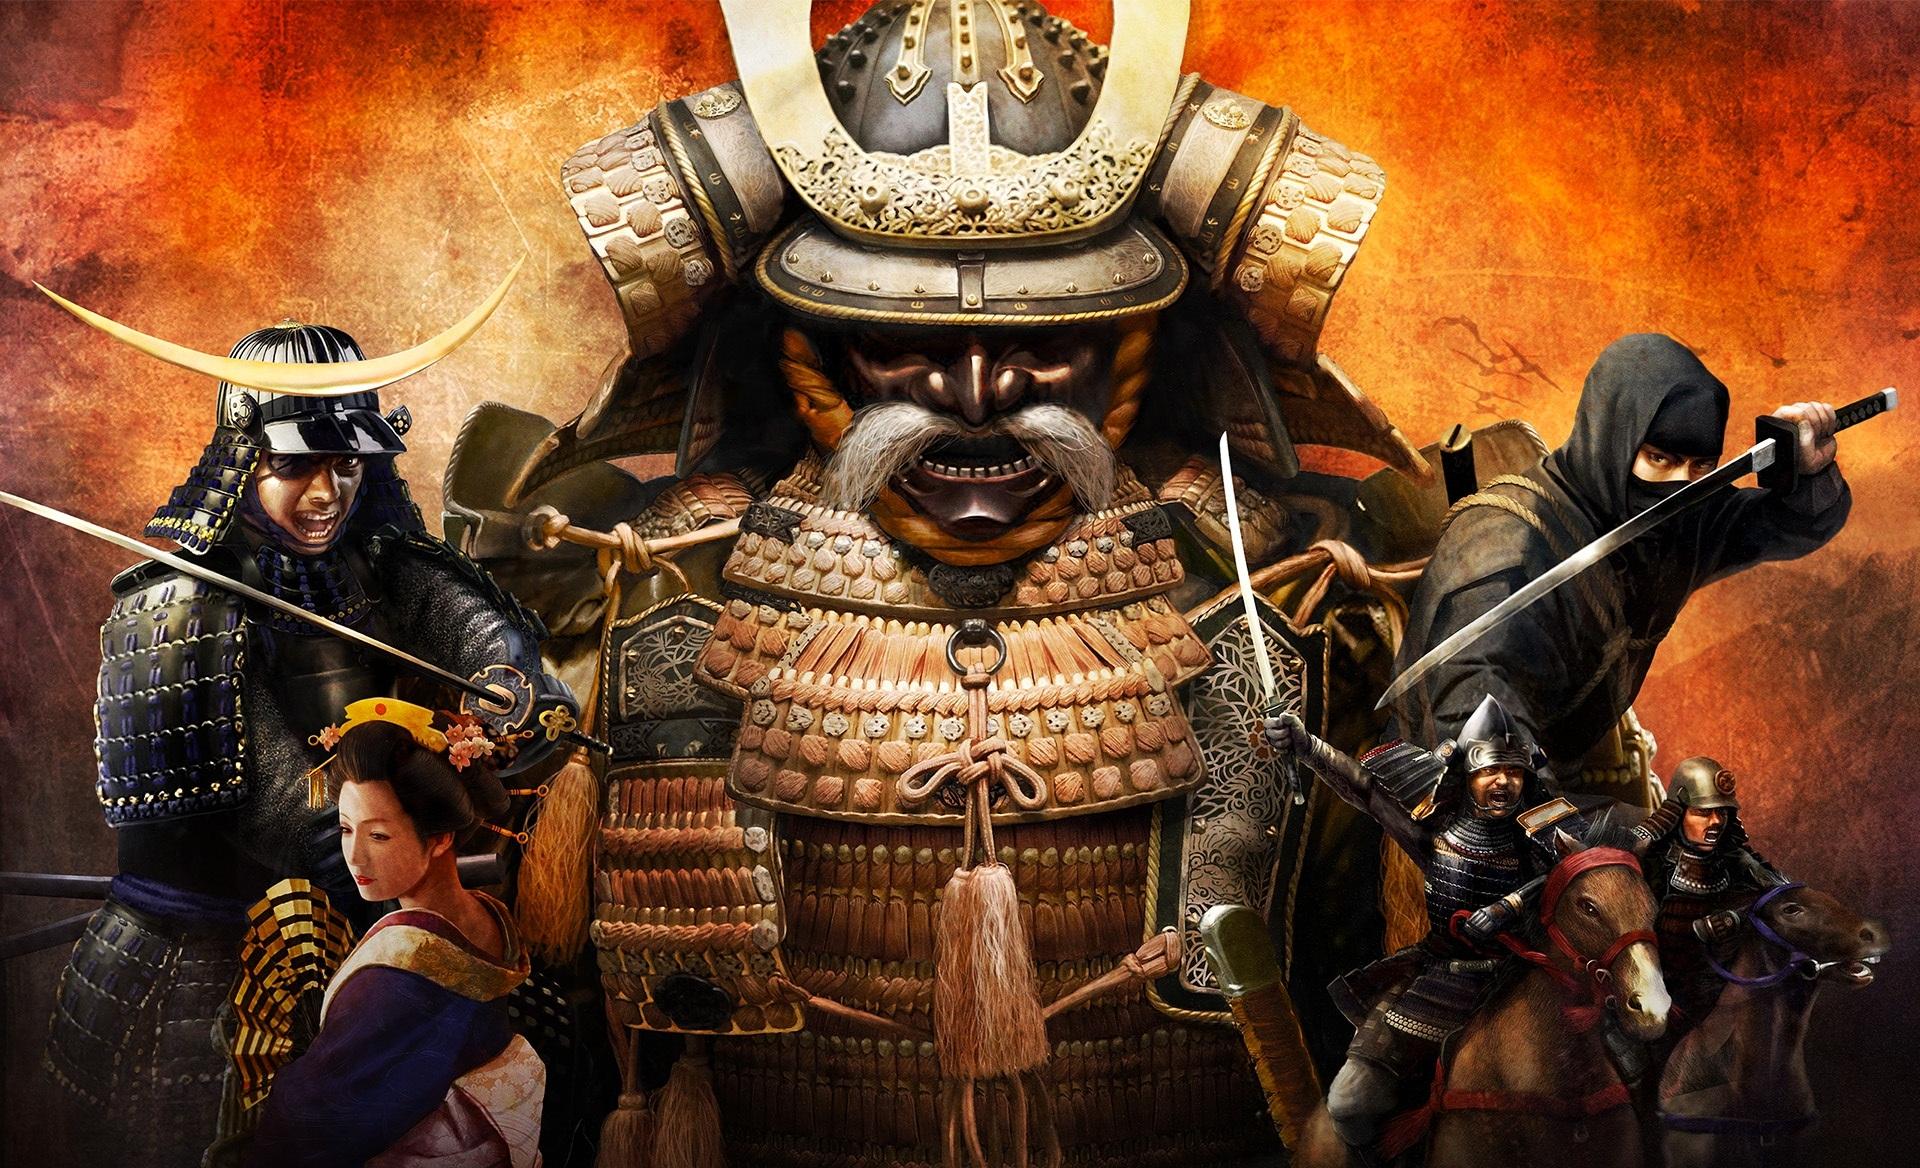 Shogun 2 Total War Wallpapers in HD High Resolution 1920x1168